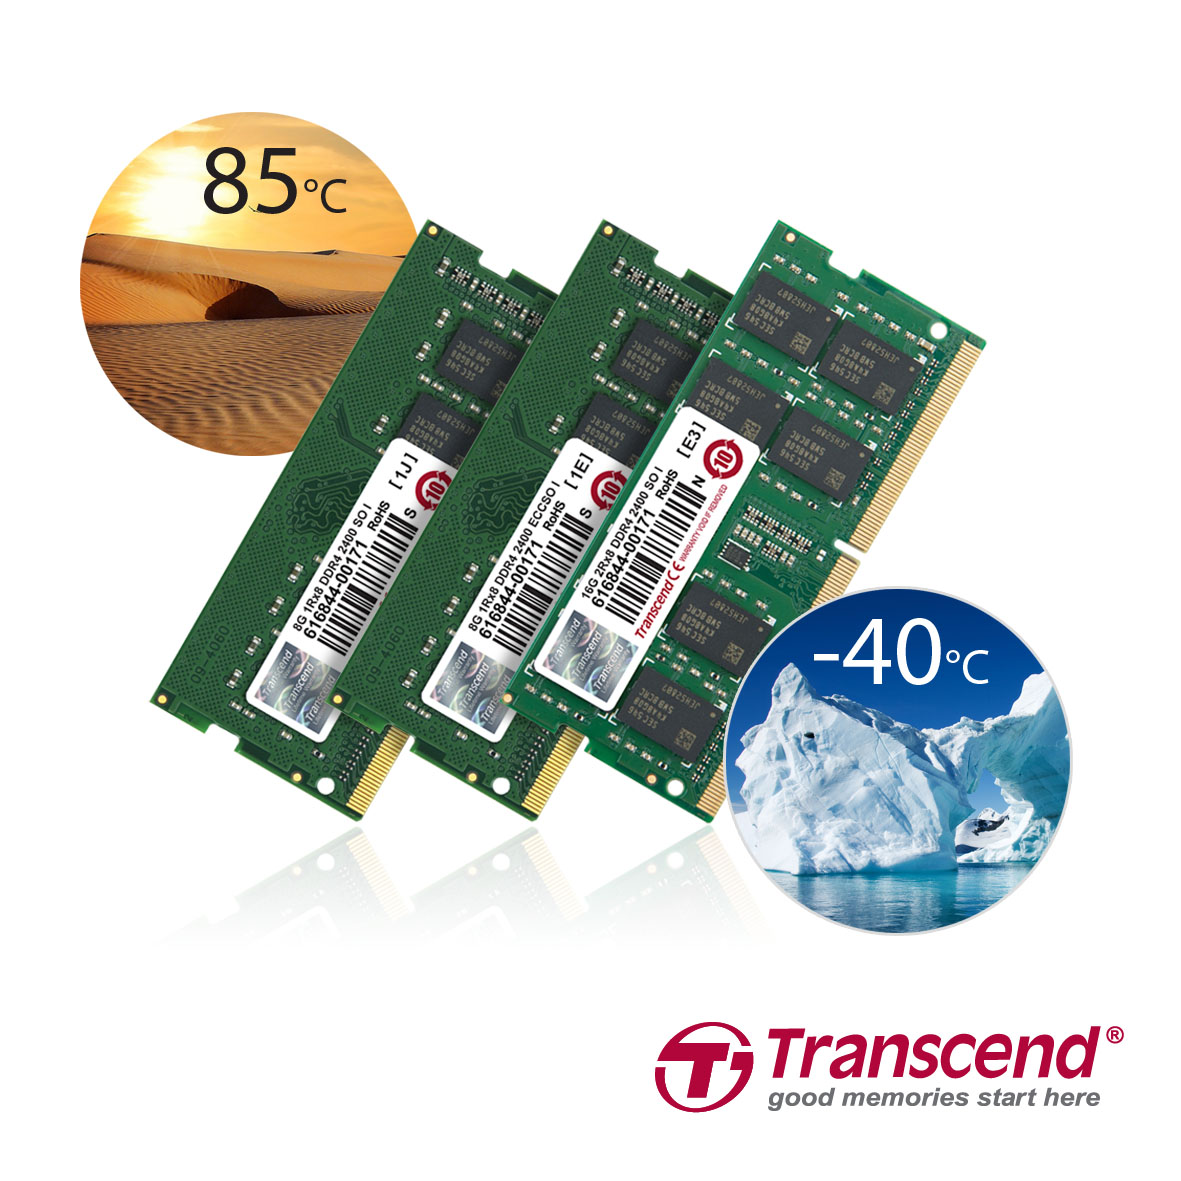 Transcend DDR4 Industrial-Grade Wide Temperature Memory Modules